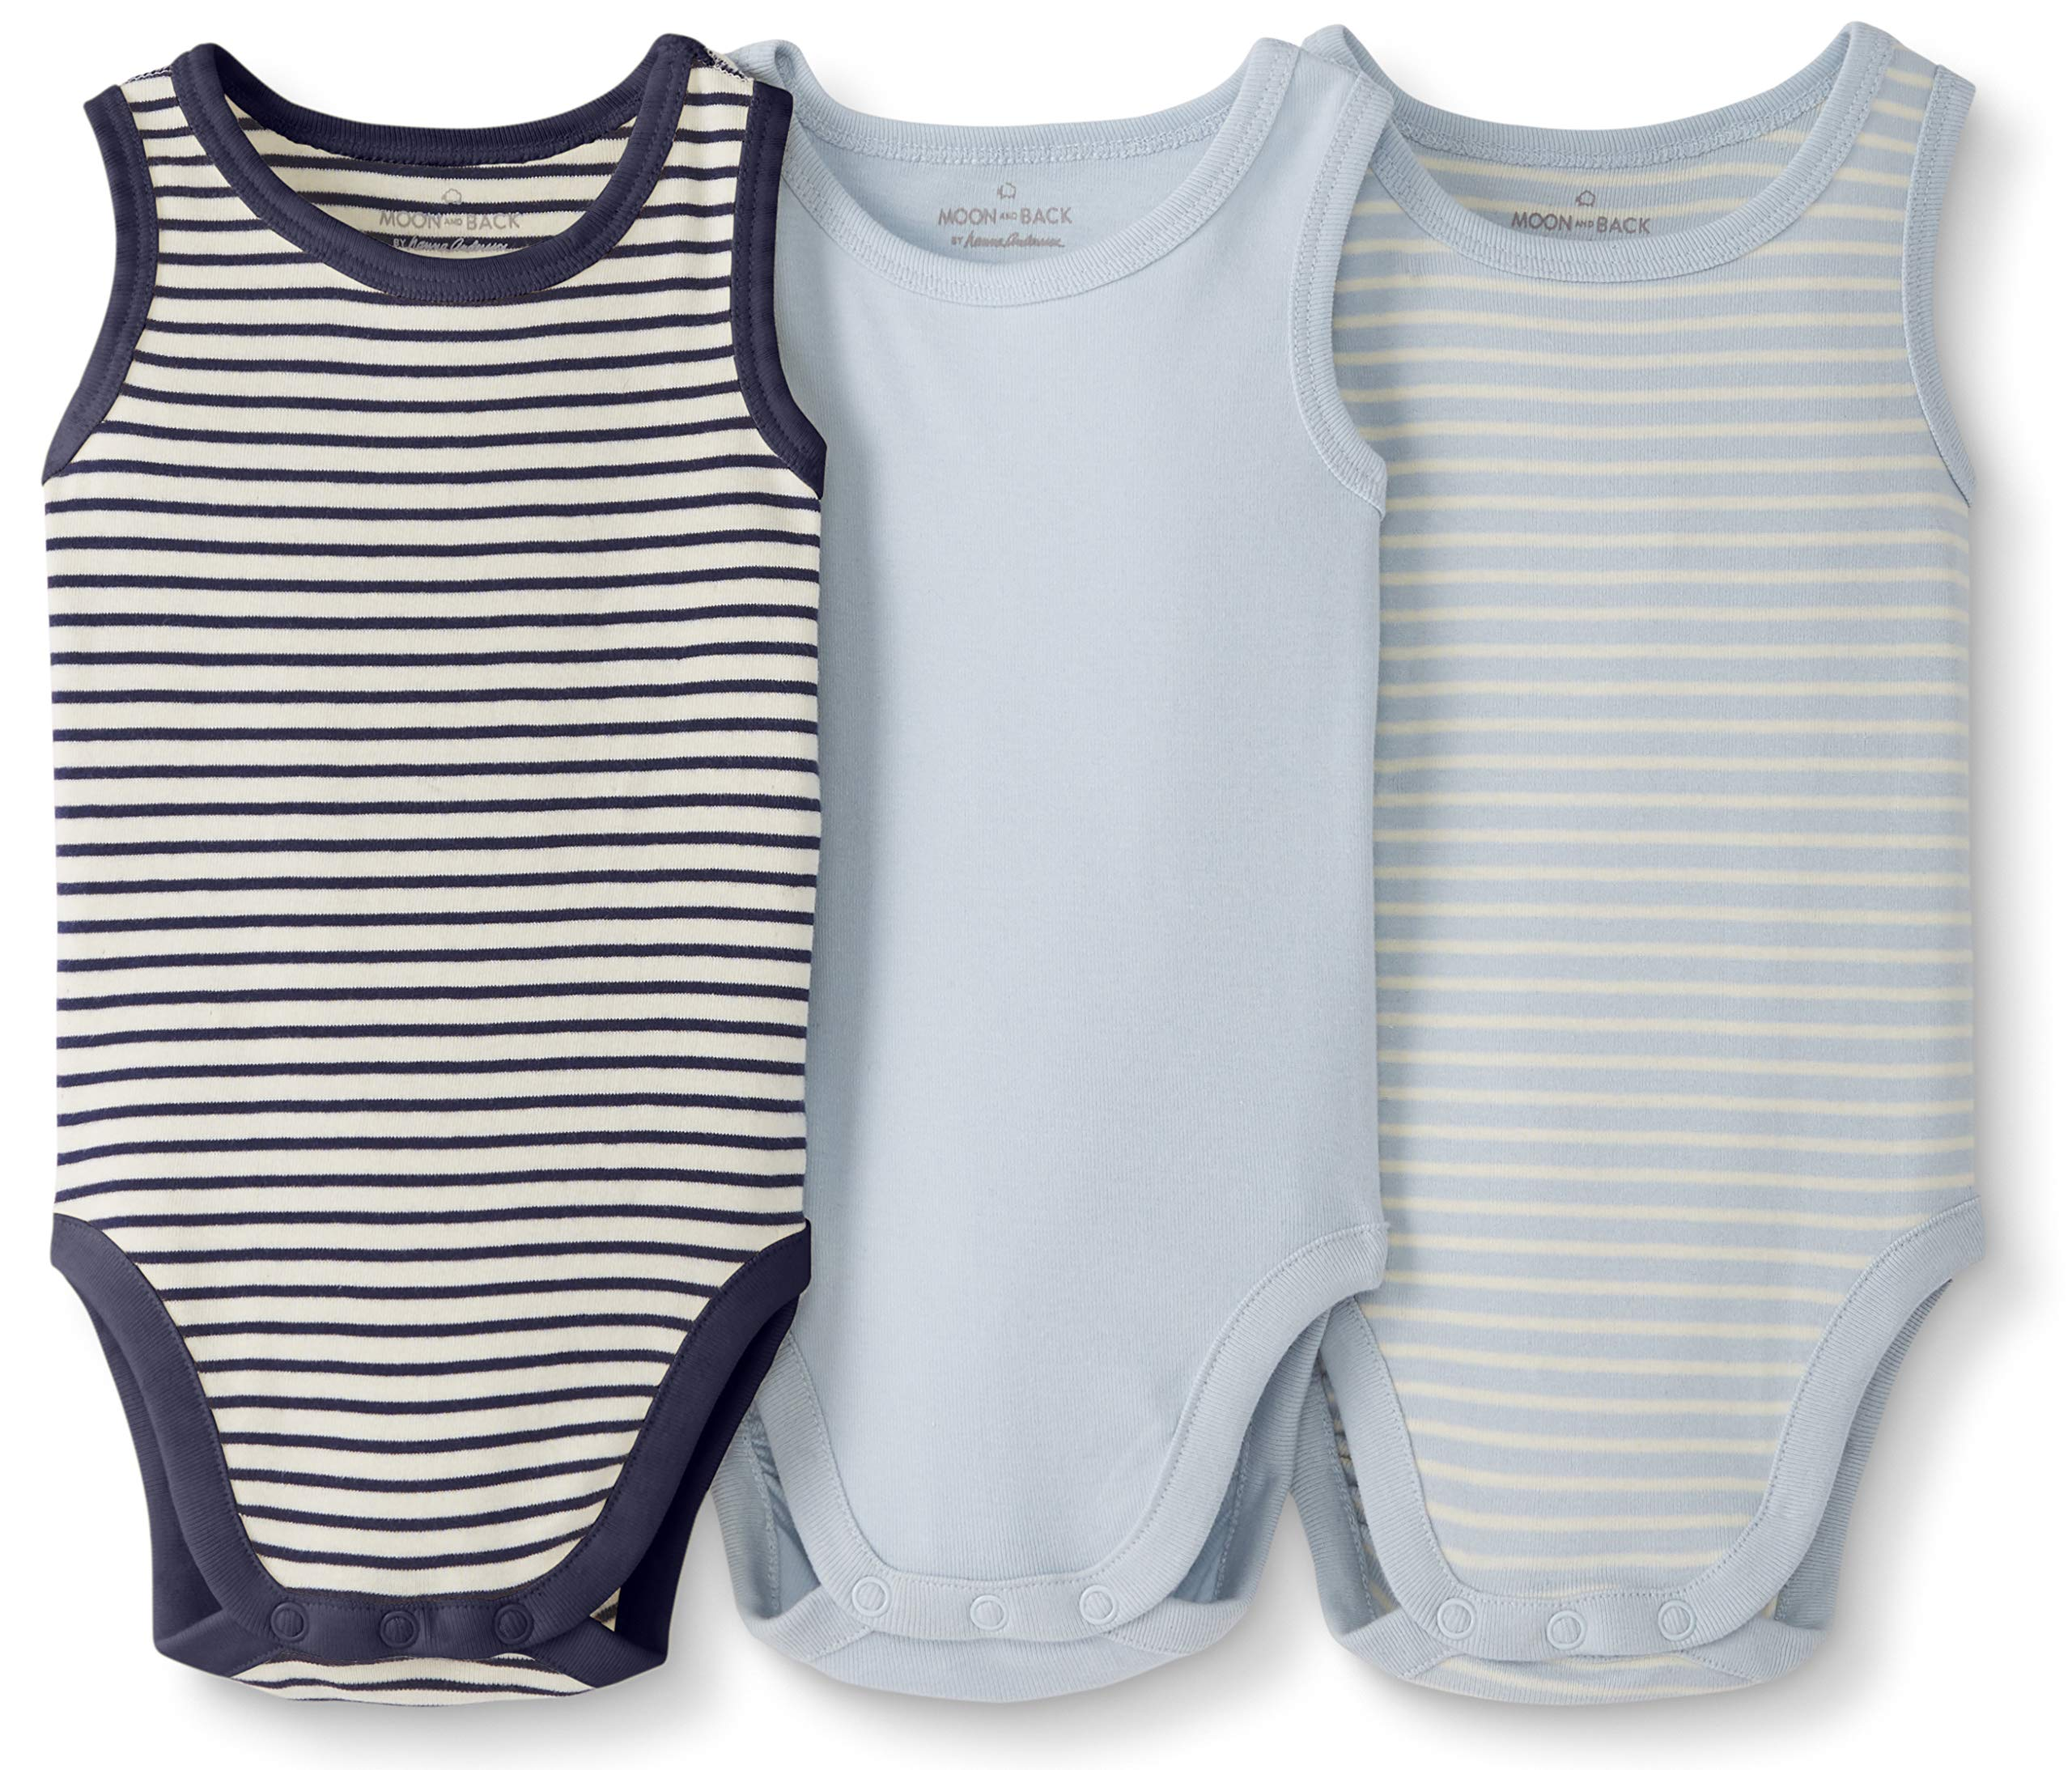 Bodysuit Zinc Stripe 2Fer 100/% Organic Cotton Short Sleeve and Long Sleeve One-Piece Bodysuits 12 Months